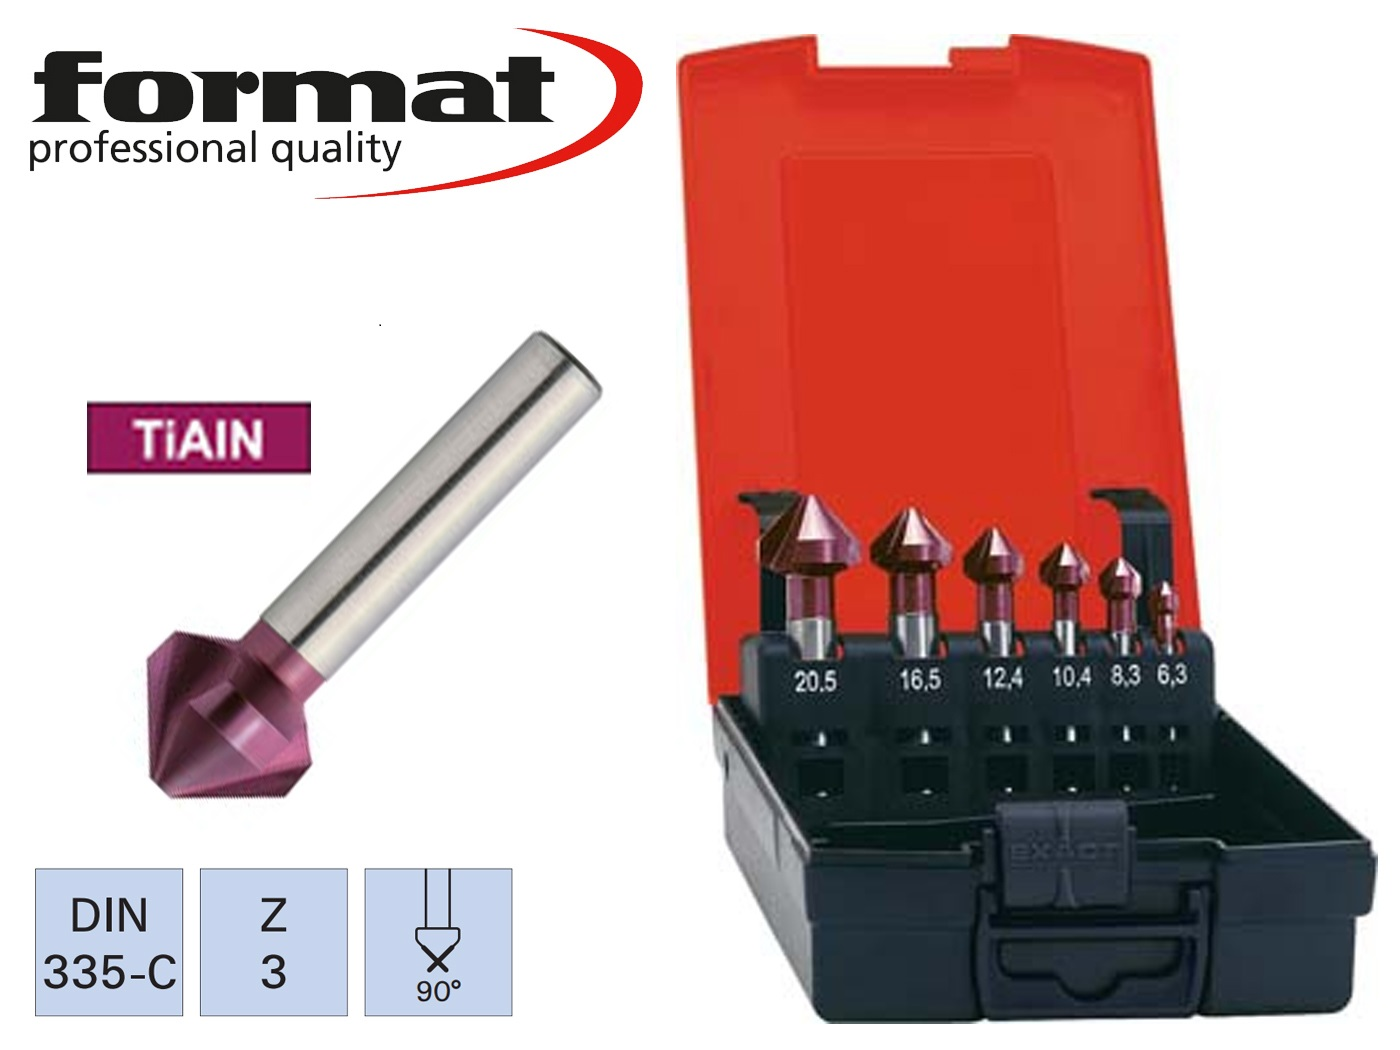 verzinkborenset DIN 335 C HSS TiAIN 90 G FORMAT | DKMTools - DKM Tools